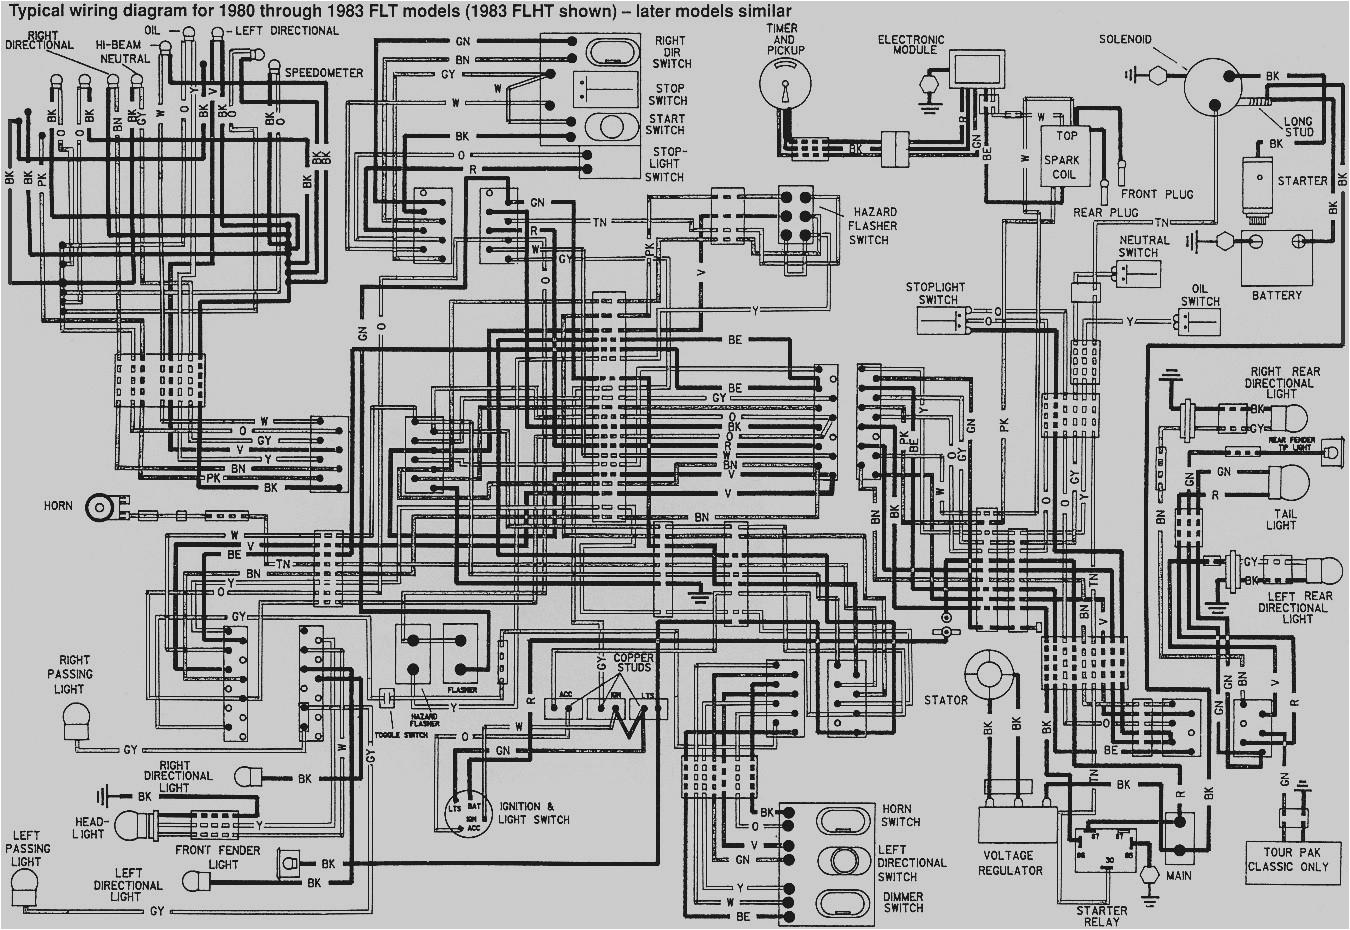 harley davidson electric wiring diagram 2006 wire diagram database 2006 harley davidson fatboy wiring diagram 2006 harley wiring diagram